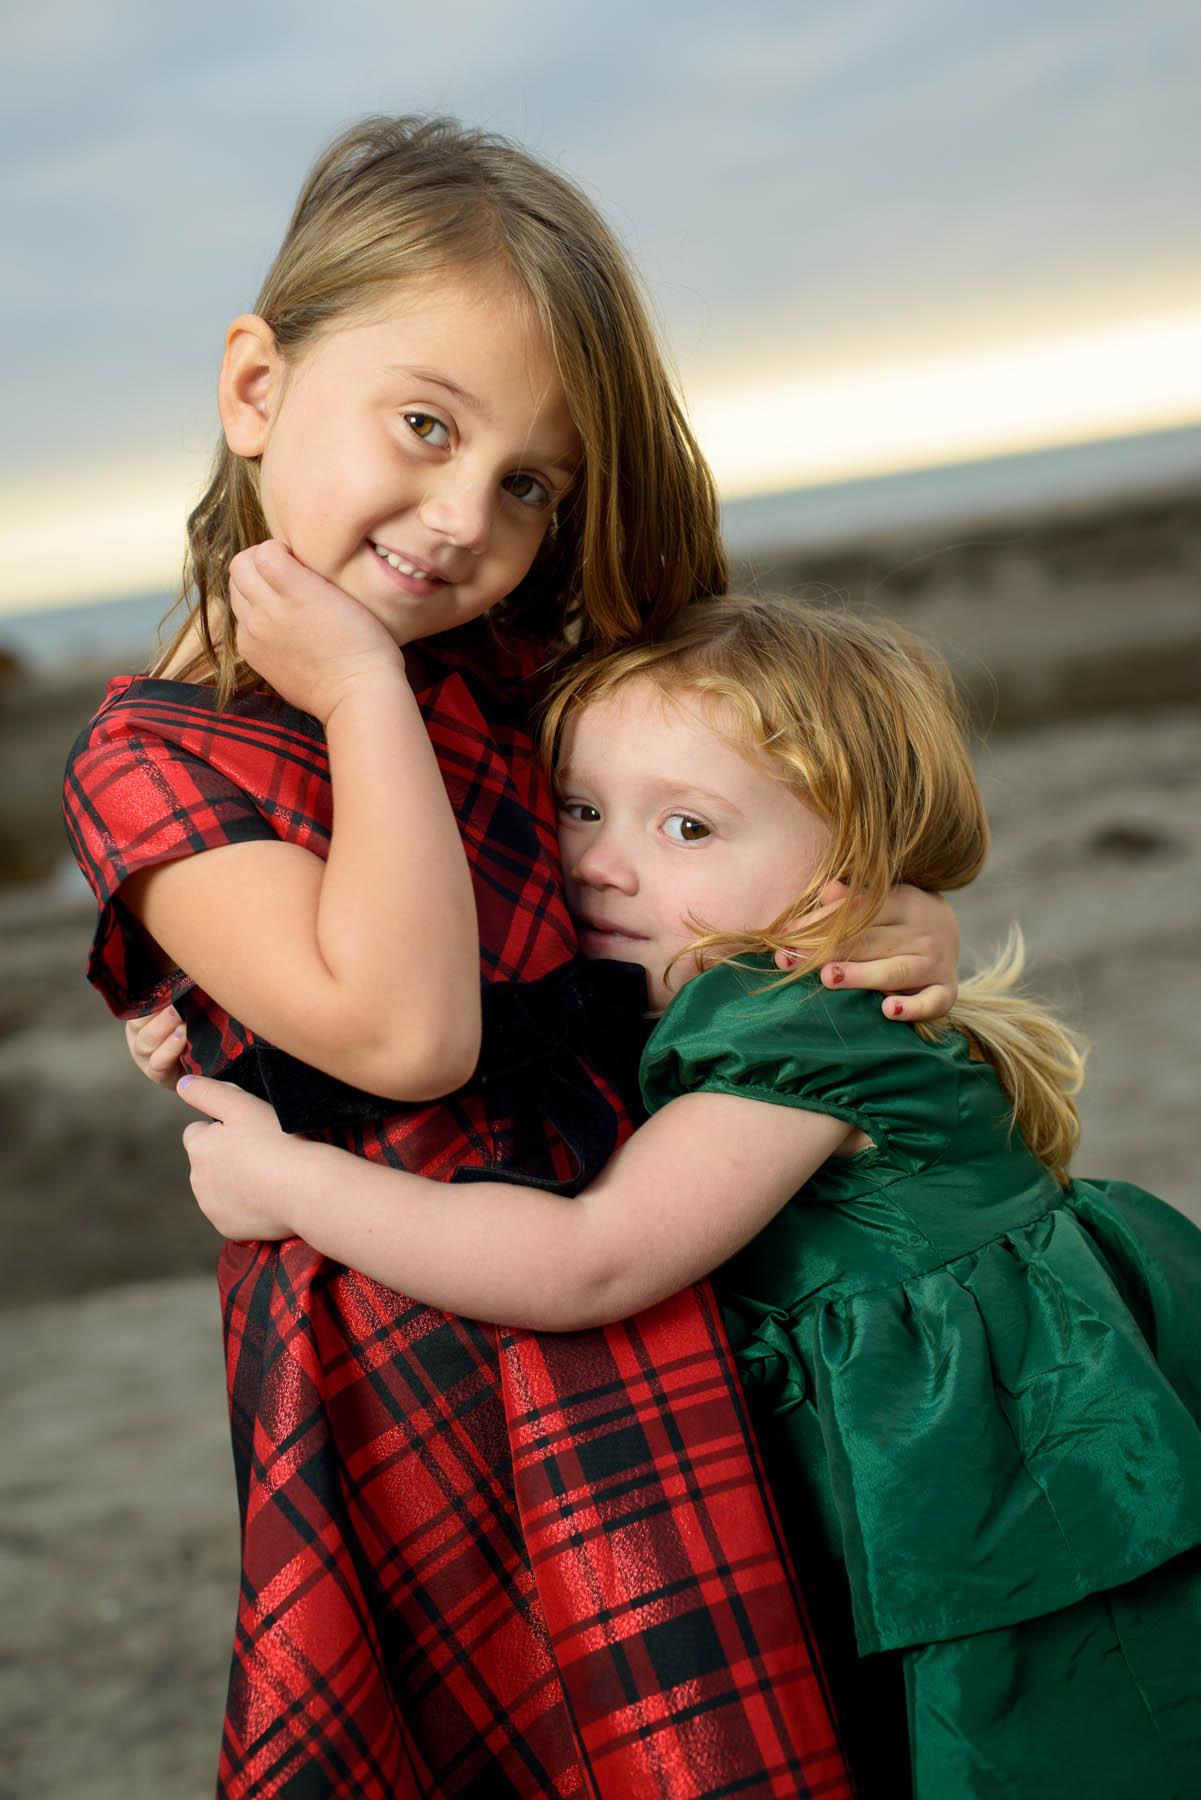 4085_d800_Monica_and_Girls_Rio_Del_Mar_Beach_Aptos_Family_Photography.jpg